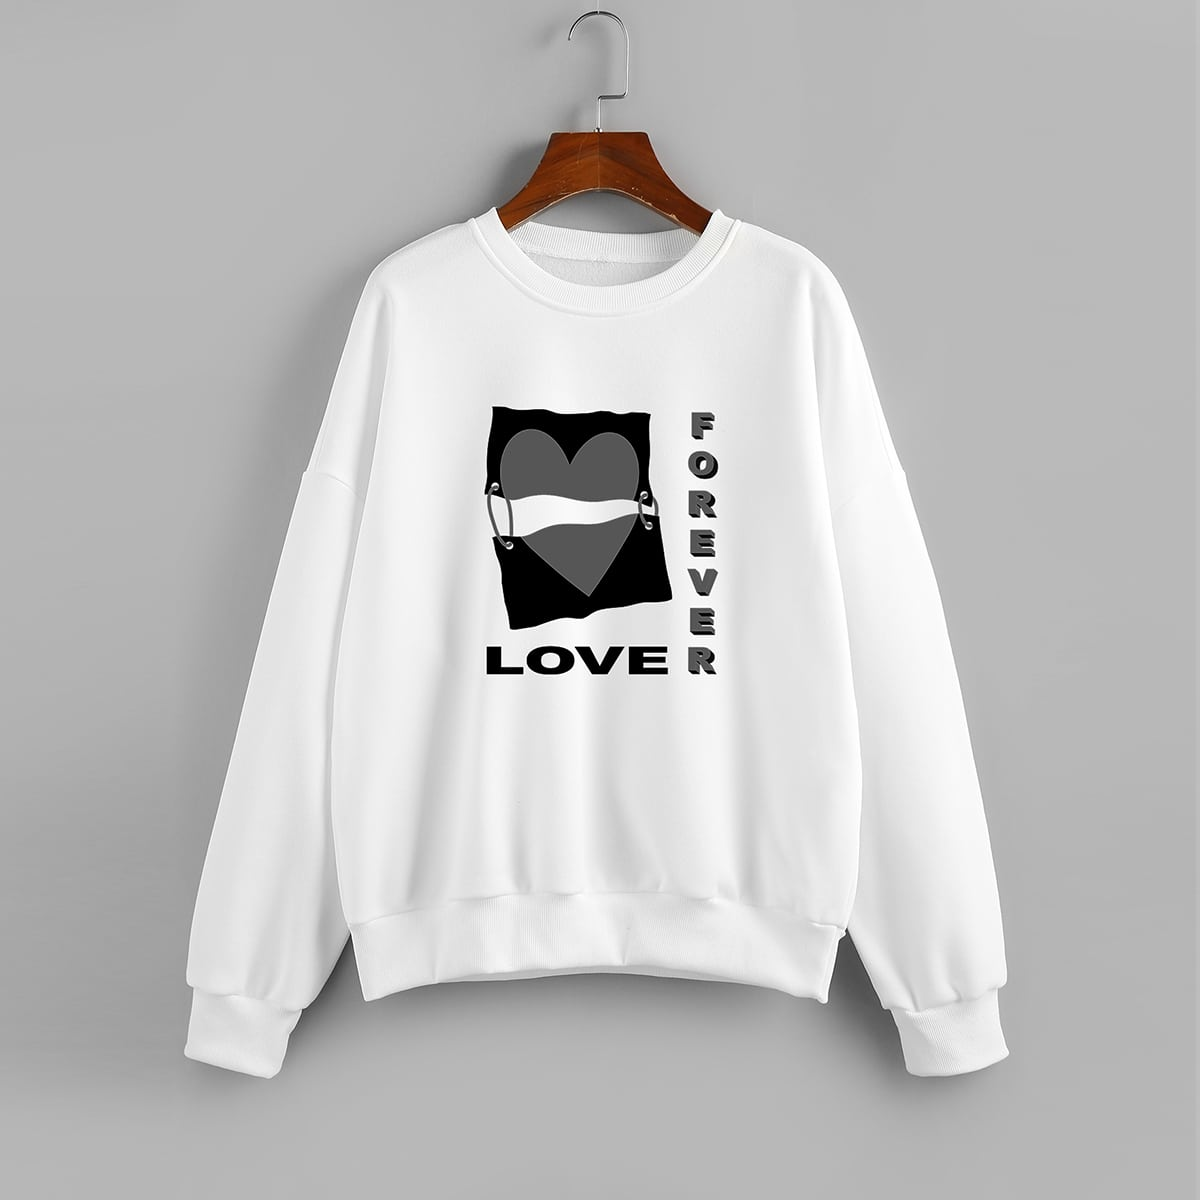 Plus Letter & Heart Print Round Neck Sweatshirt